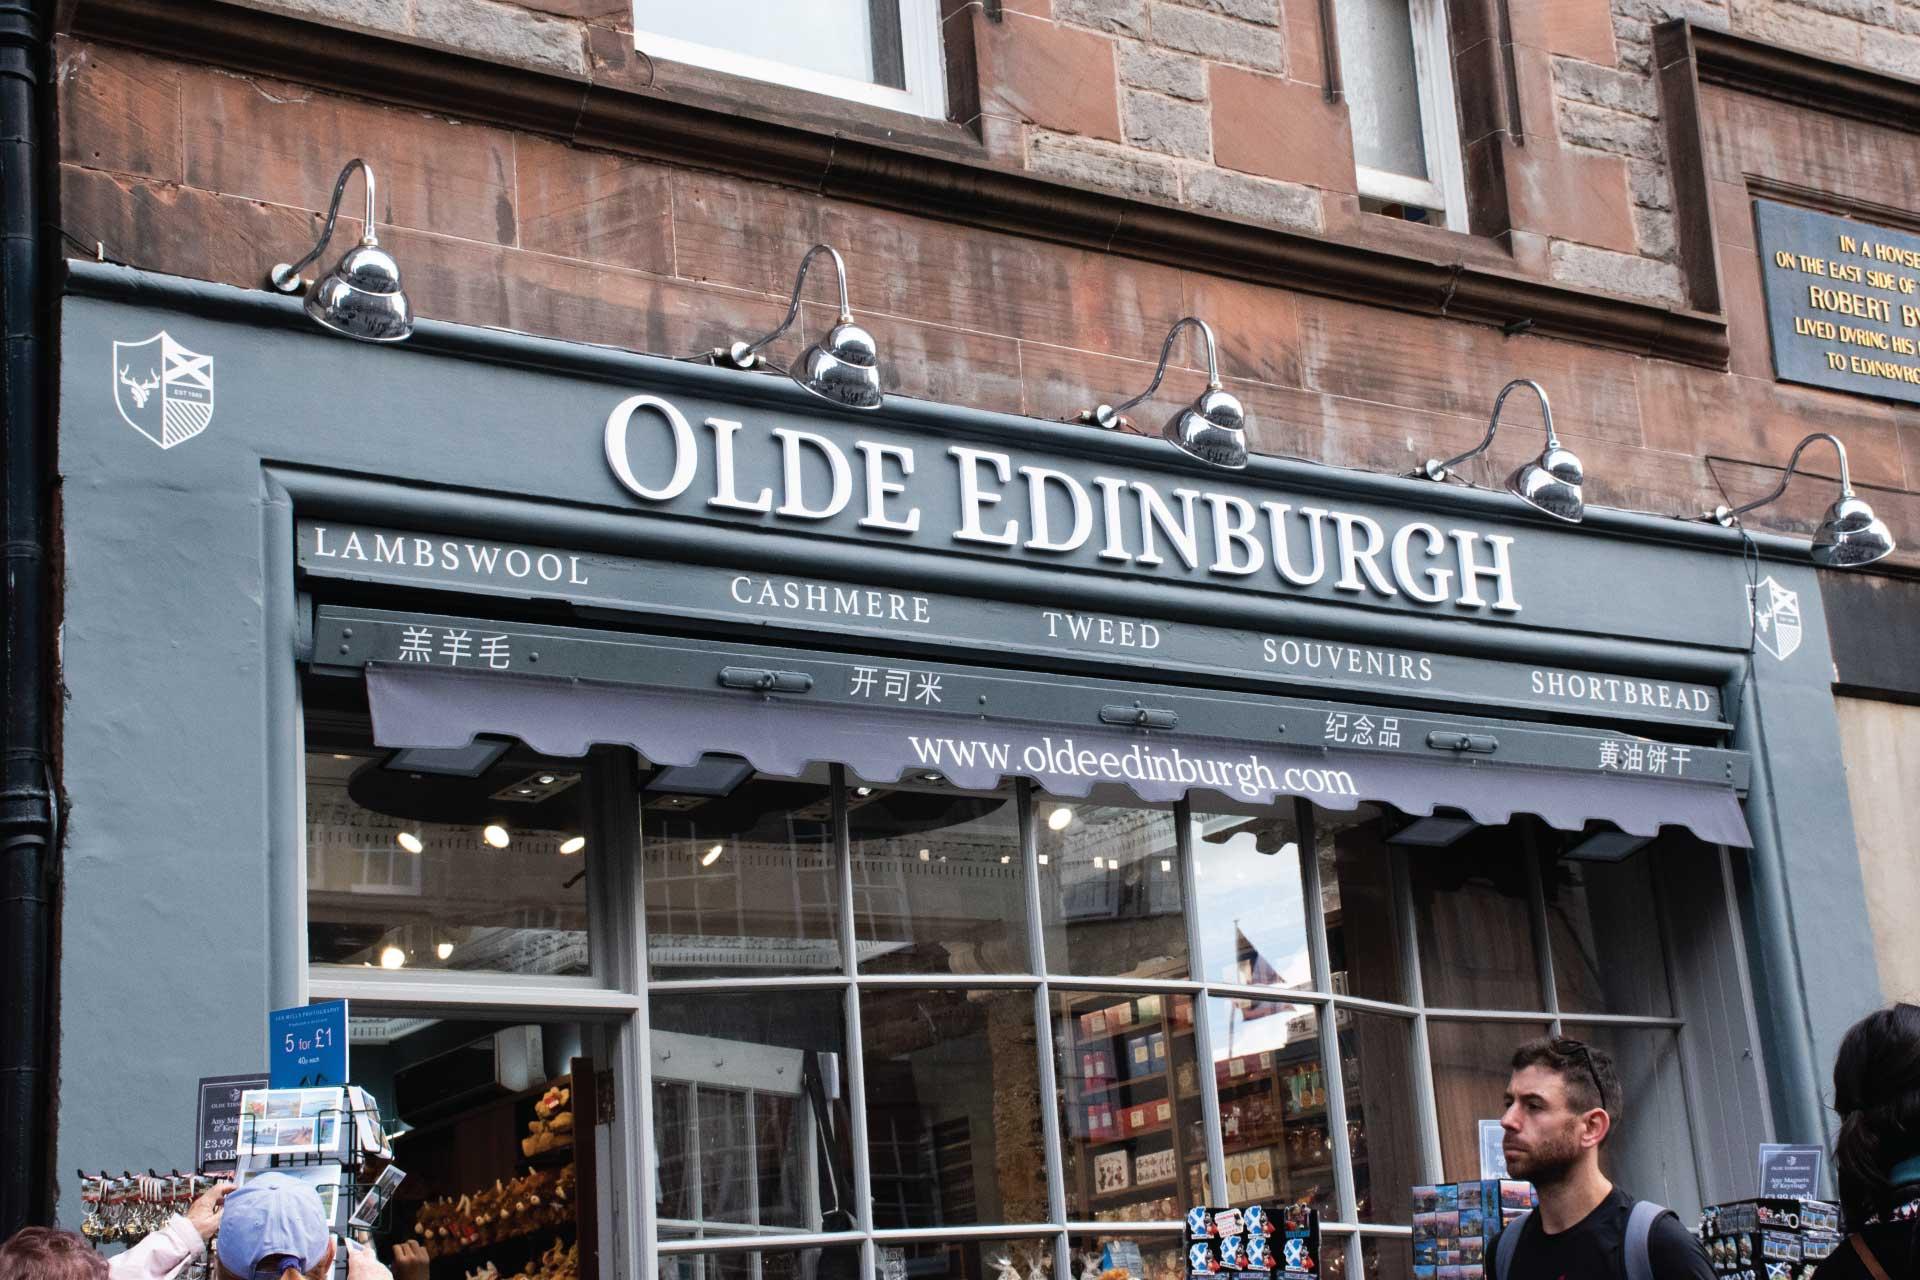 Olde Edinburgh Branding